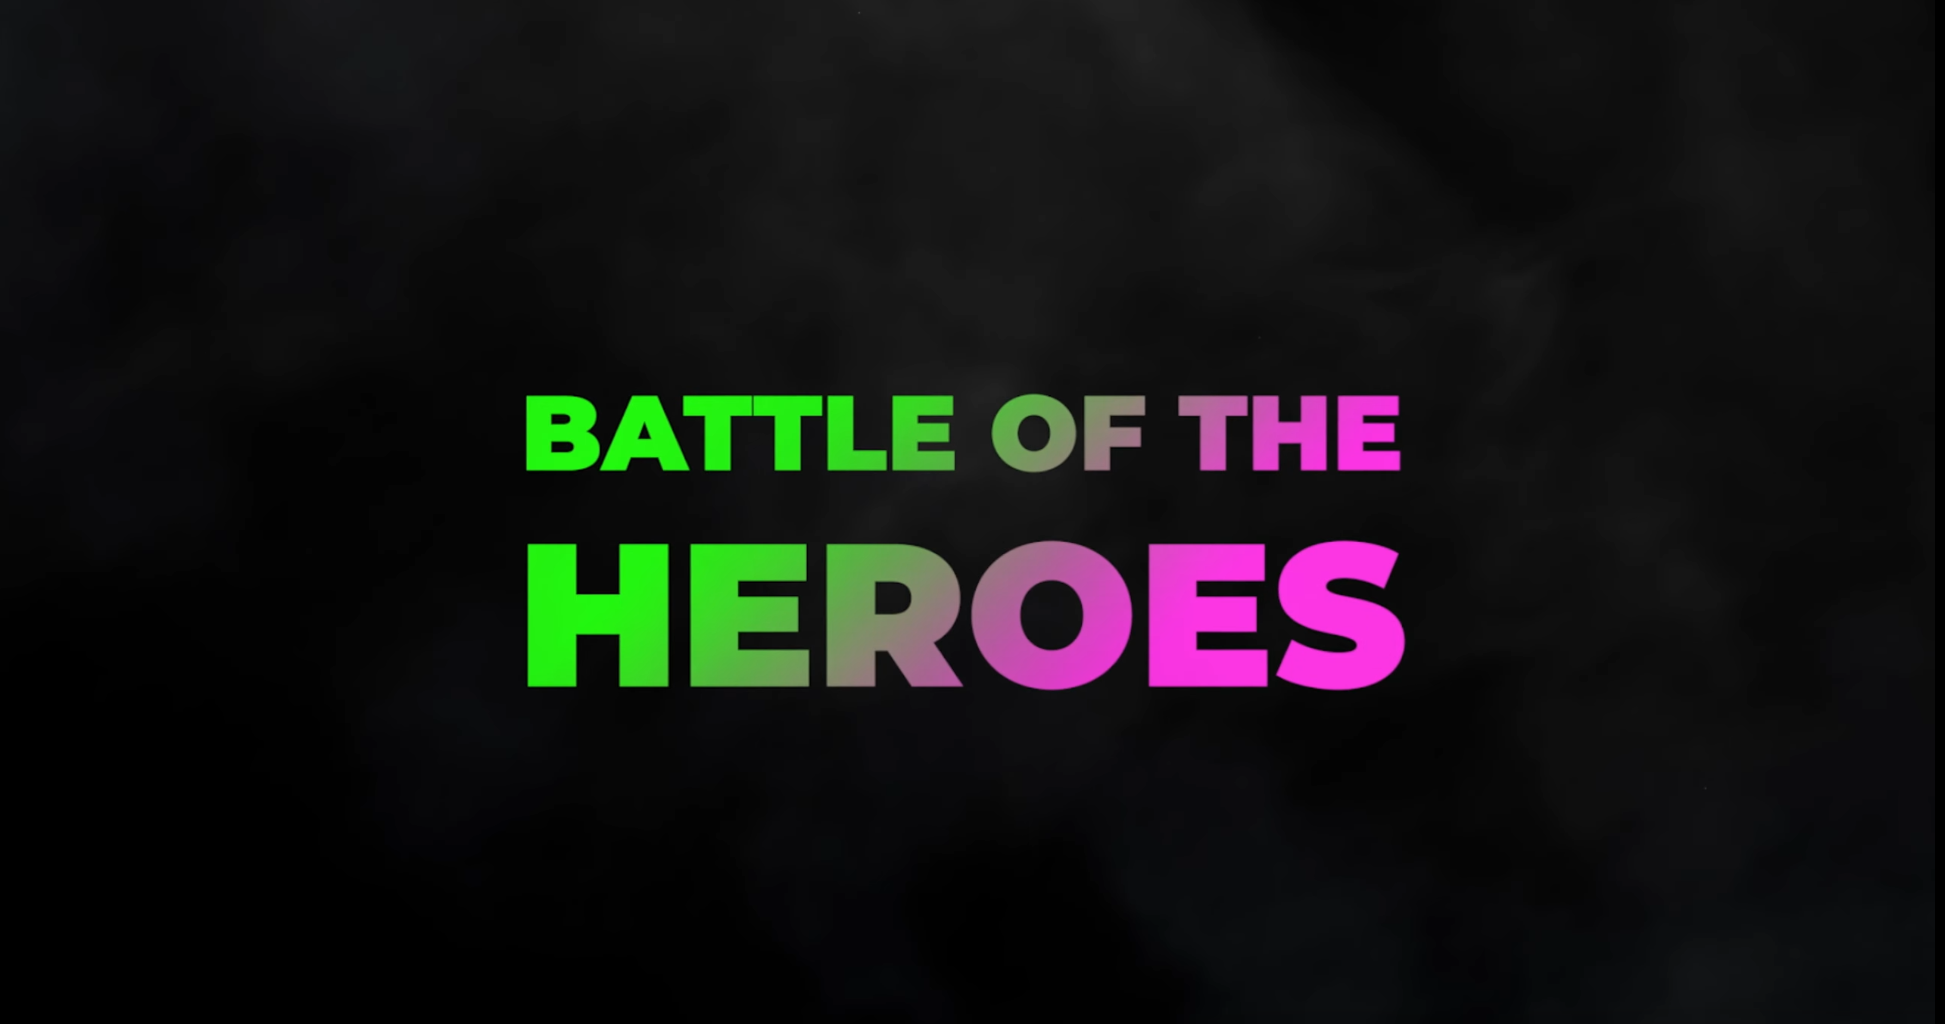 Battle of The Heroes - Sollefteå 2021